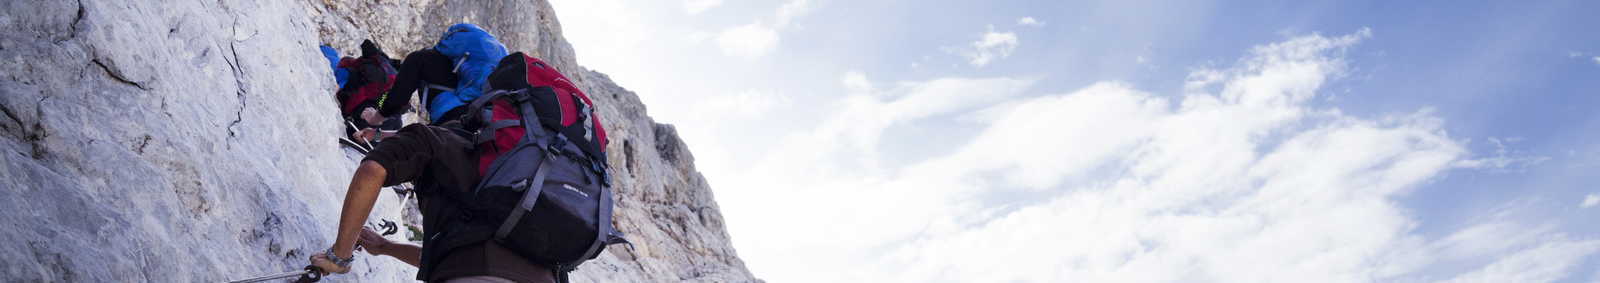 Ascending Mt Triglav, Slovenia